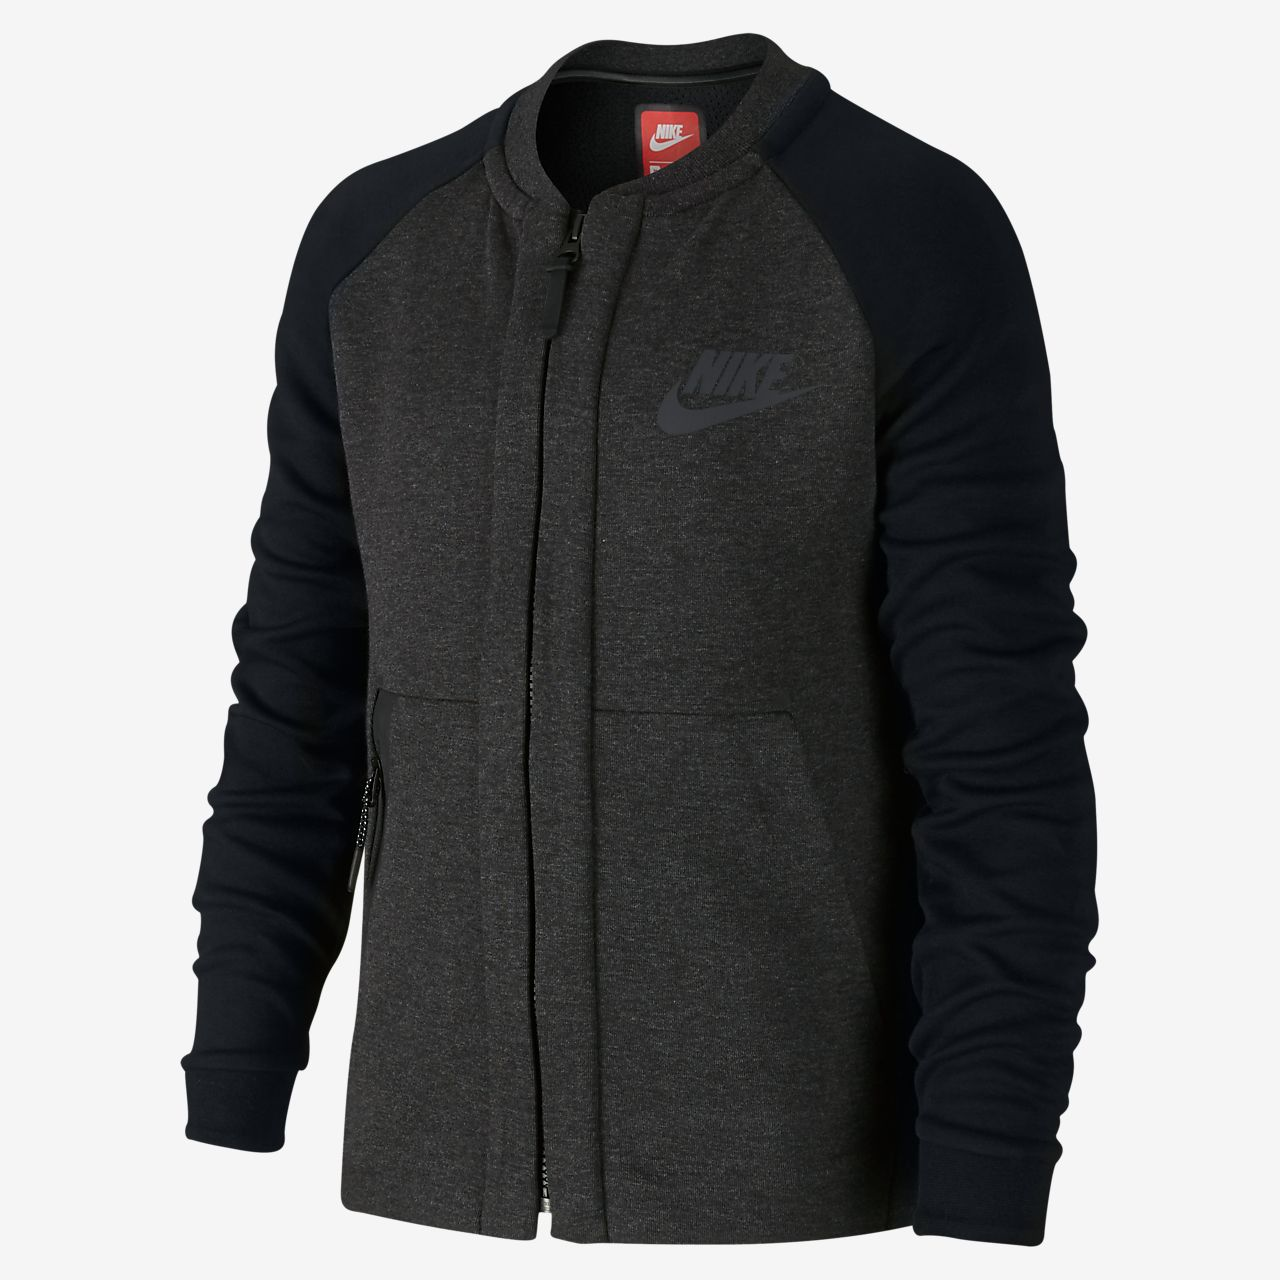 169bb85935a7 Giacca Nike Sportswear Tech Fleece Bomber - Ragazzo. Nike.com IT